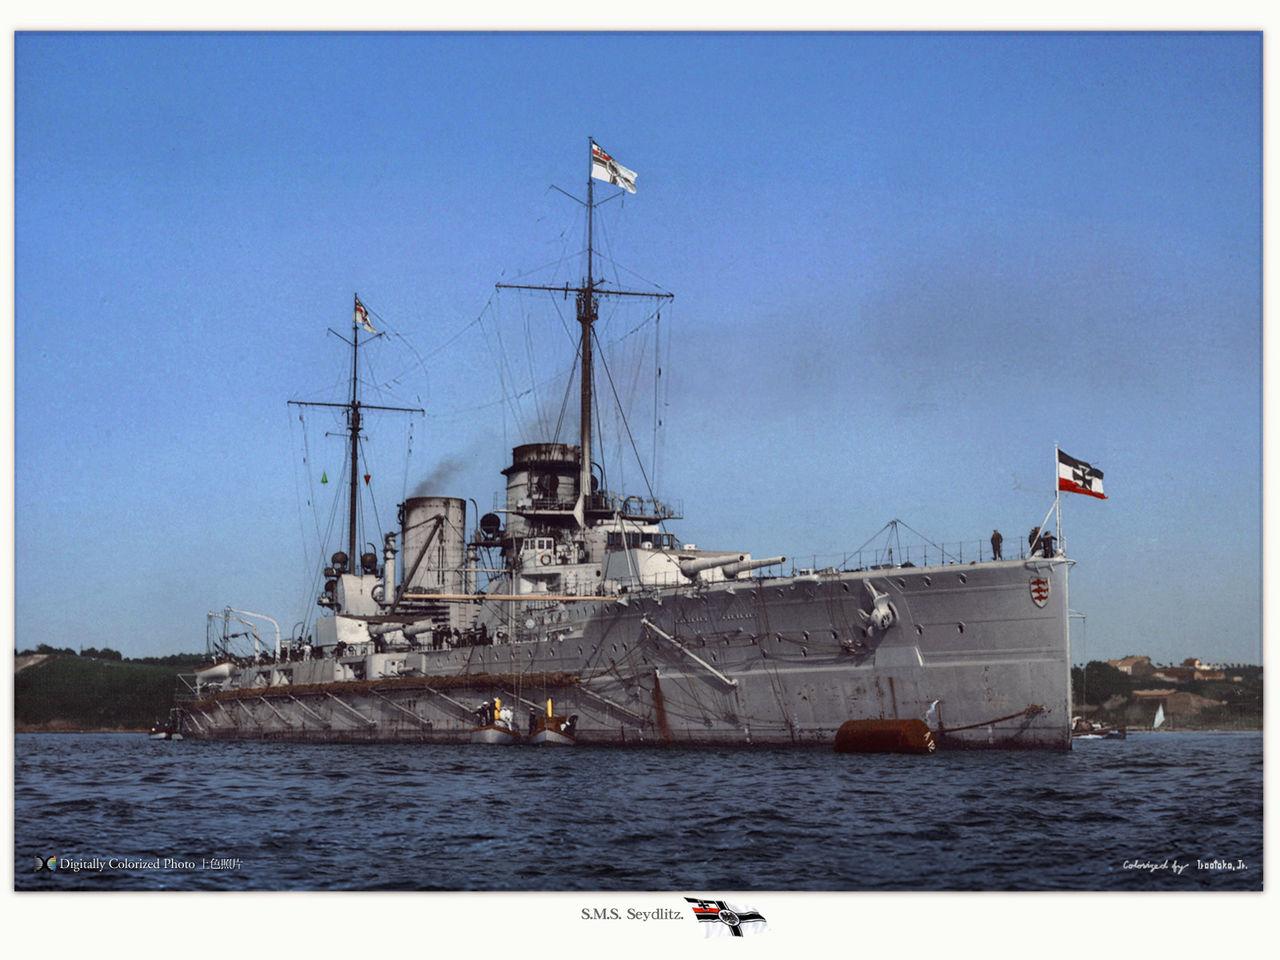 Croiseur de bataille SMS Seydlitz 1/350 Hobby Boss  - Page 3 S.m.s.-seydlitz-x4jq3